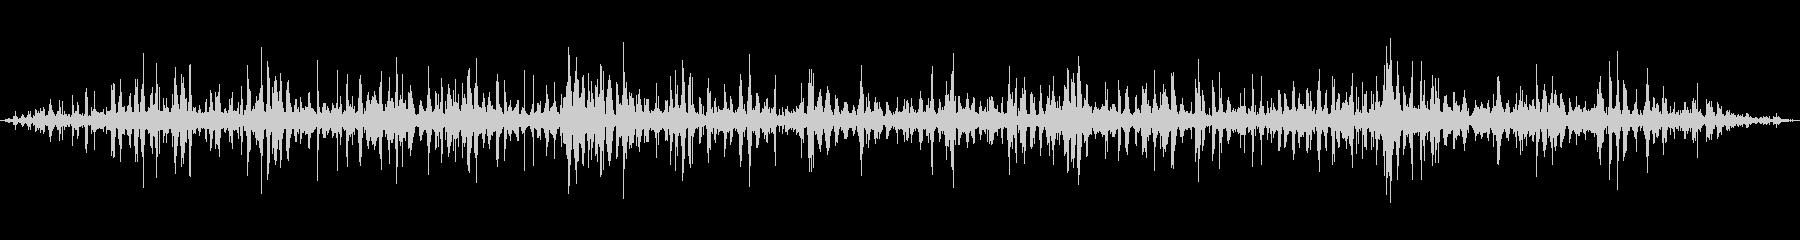 [ASMR]波打ち際の音_001の未再生の波形